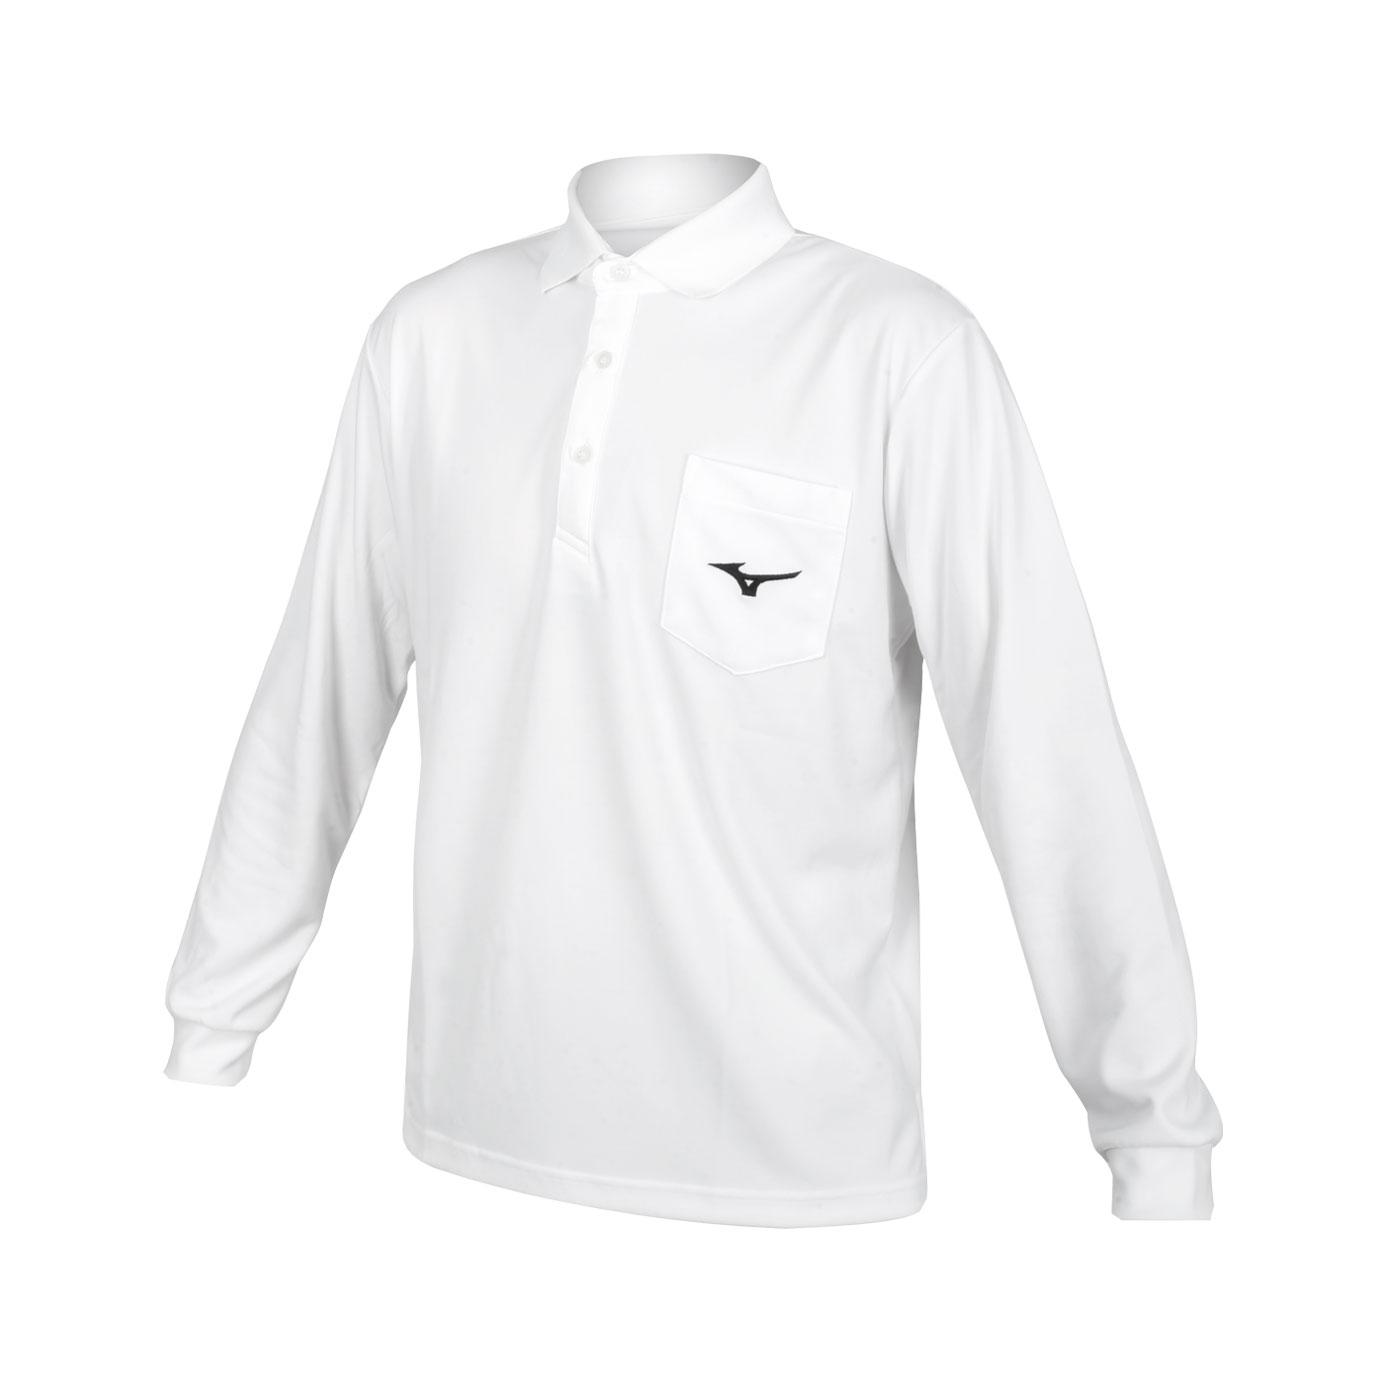 MIZUNO 男款長袖POLO衫 32TA154301 - 白黑